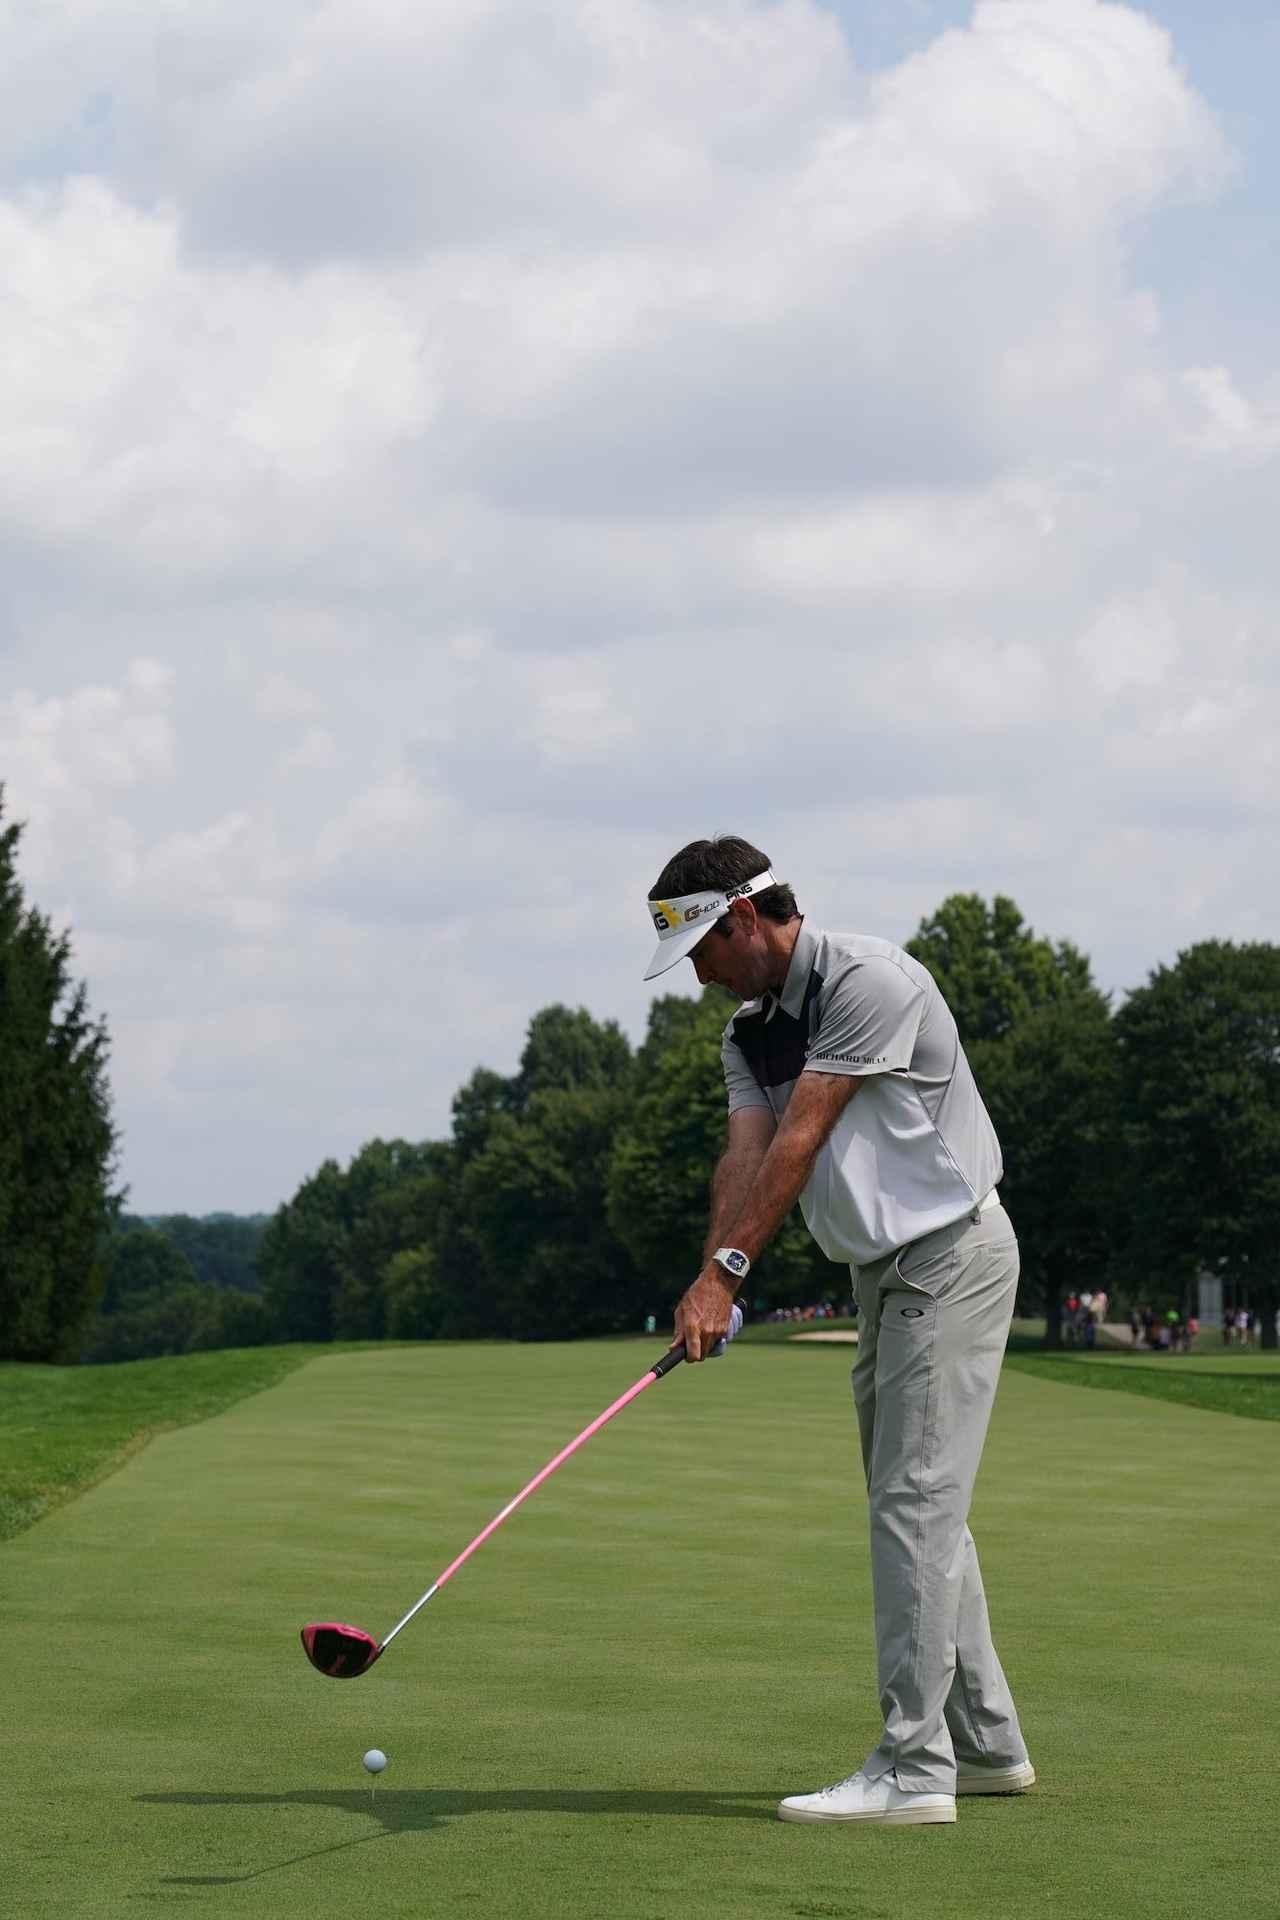 Images : 2番目の画像 - 強烈! バッバ・ワトソンのドライバーショット - みんなのゴルフダイジェスト